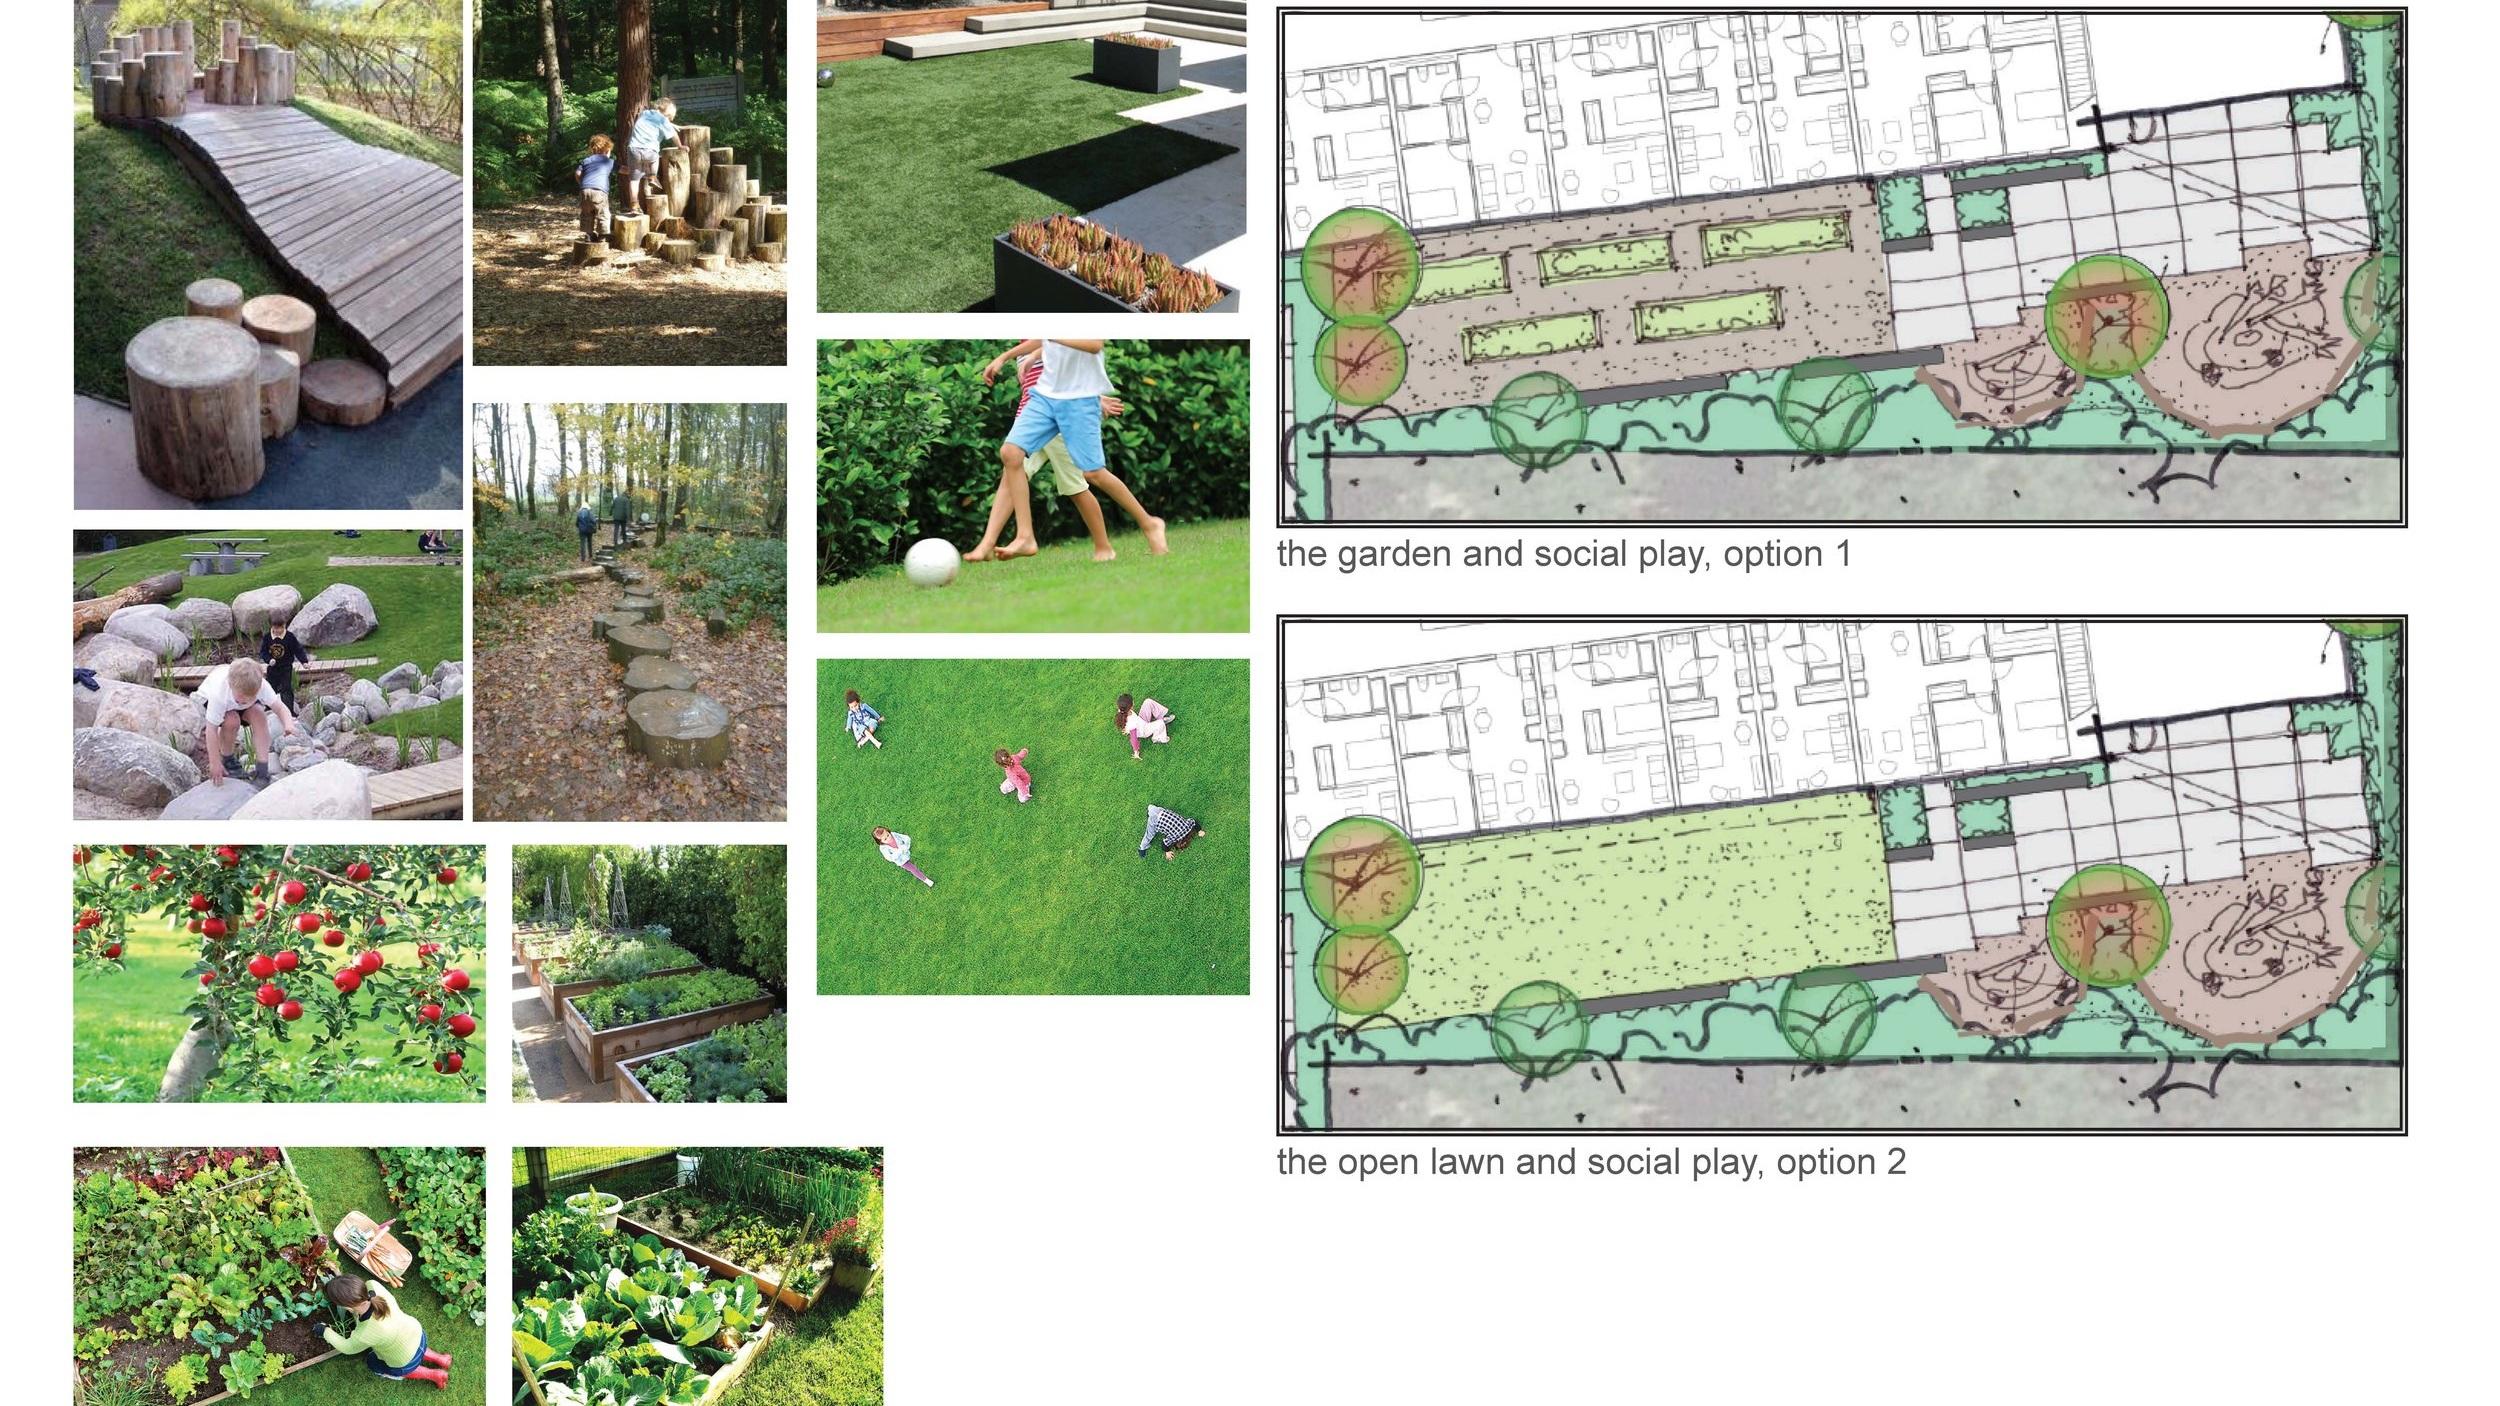 LIHI-Fazio Revisedlandscape concept 3.jpg